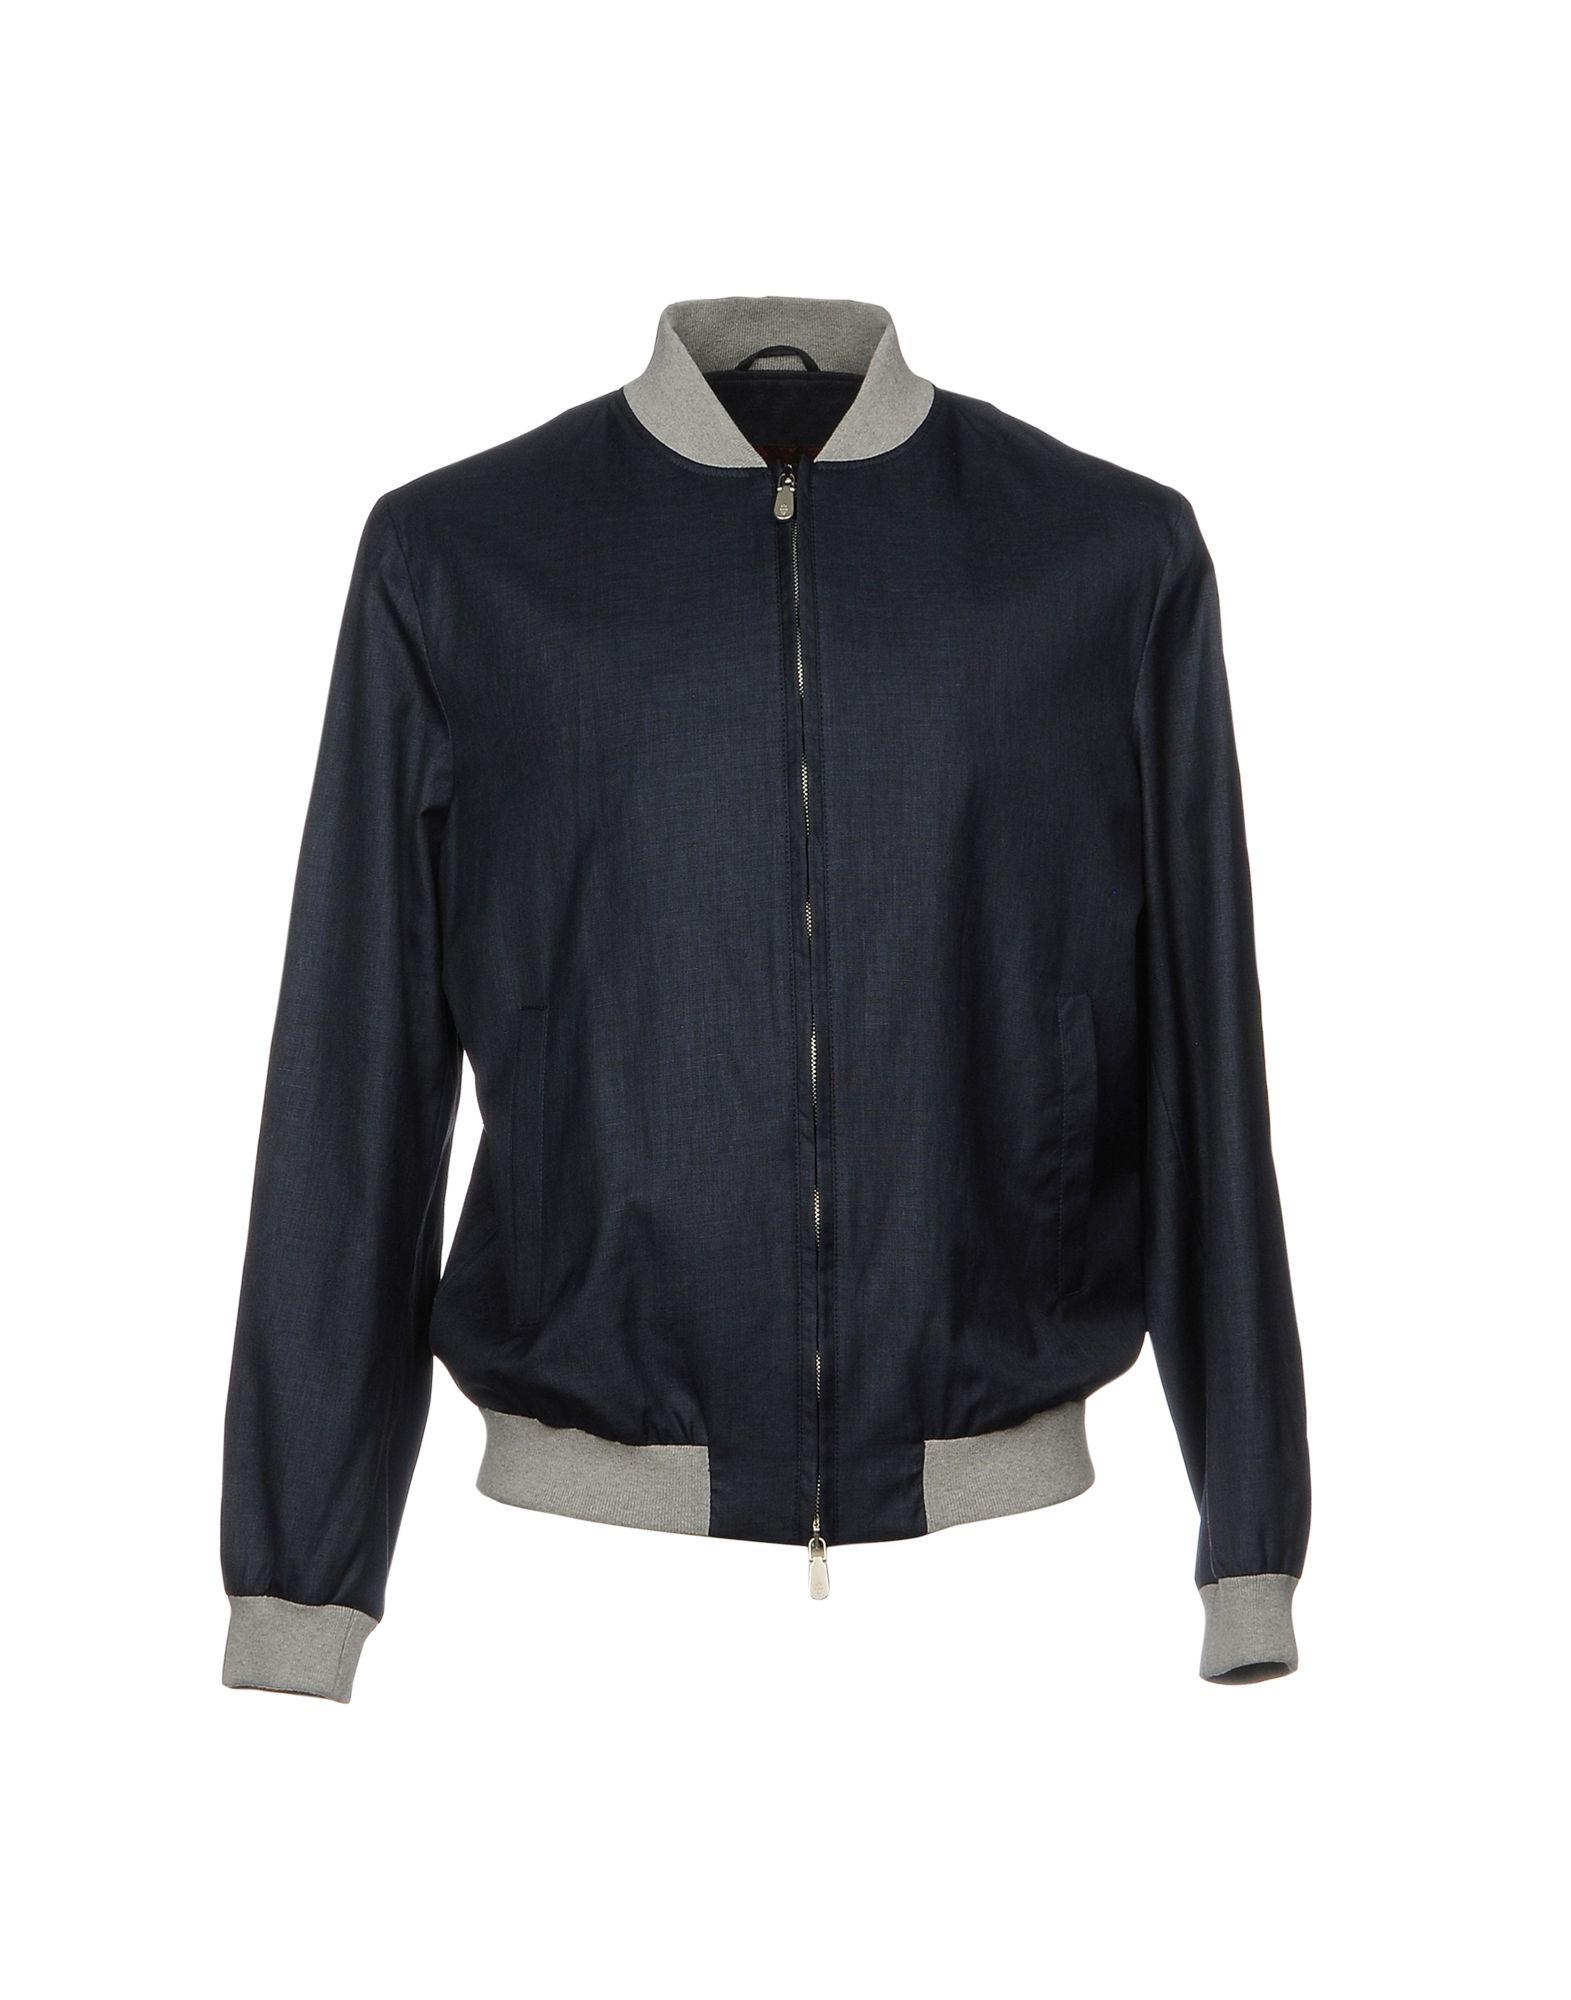 Giubbotto Jeans Eleventy Uomo - Acquista online su